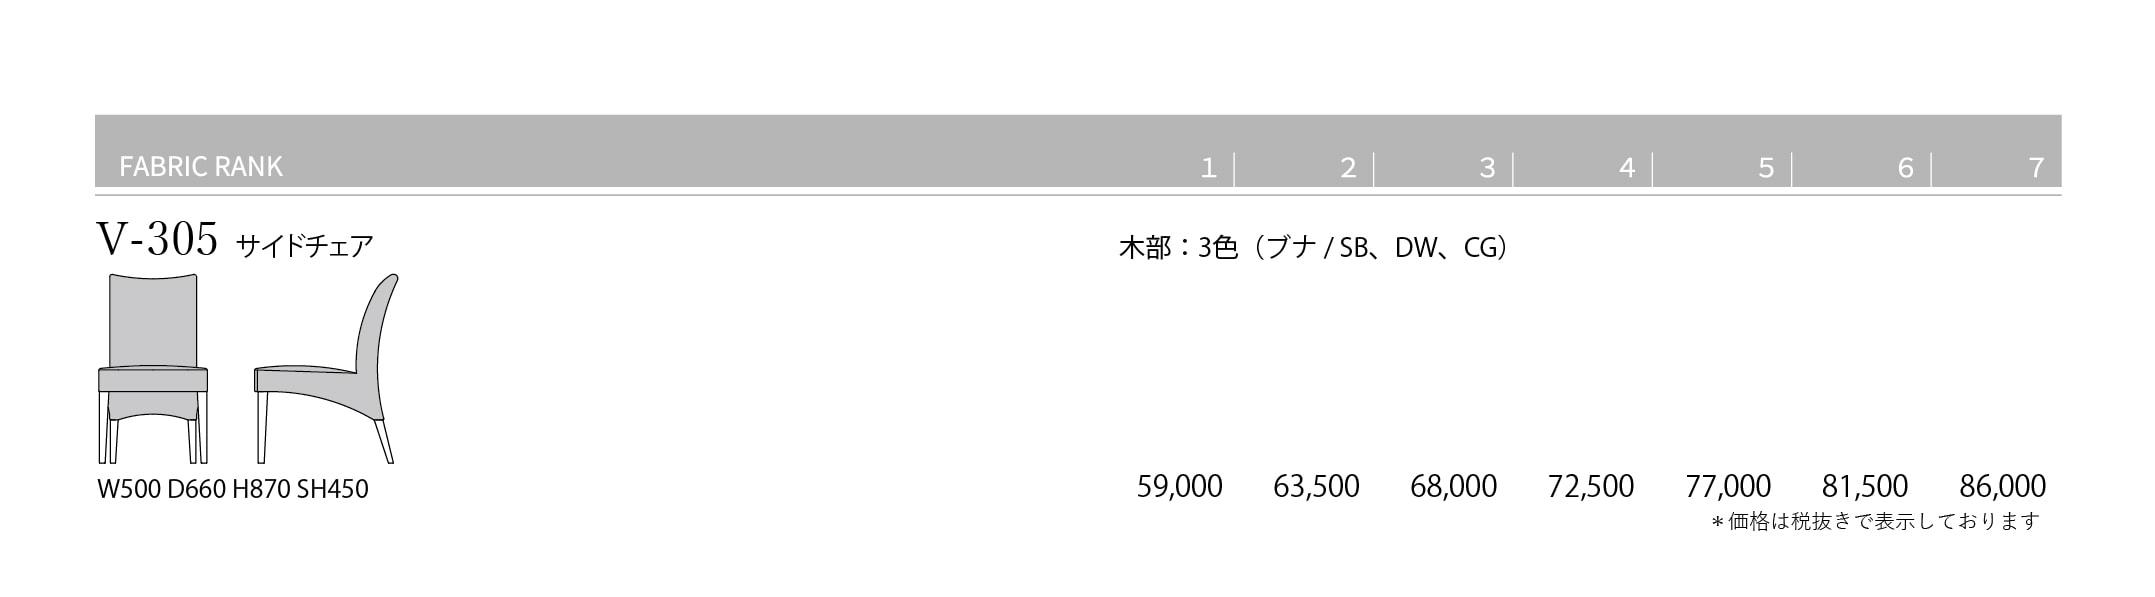 V-305 Price List